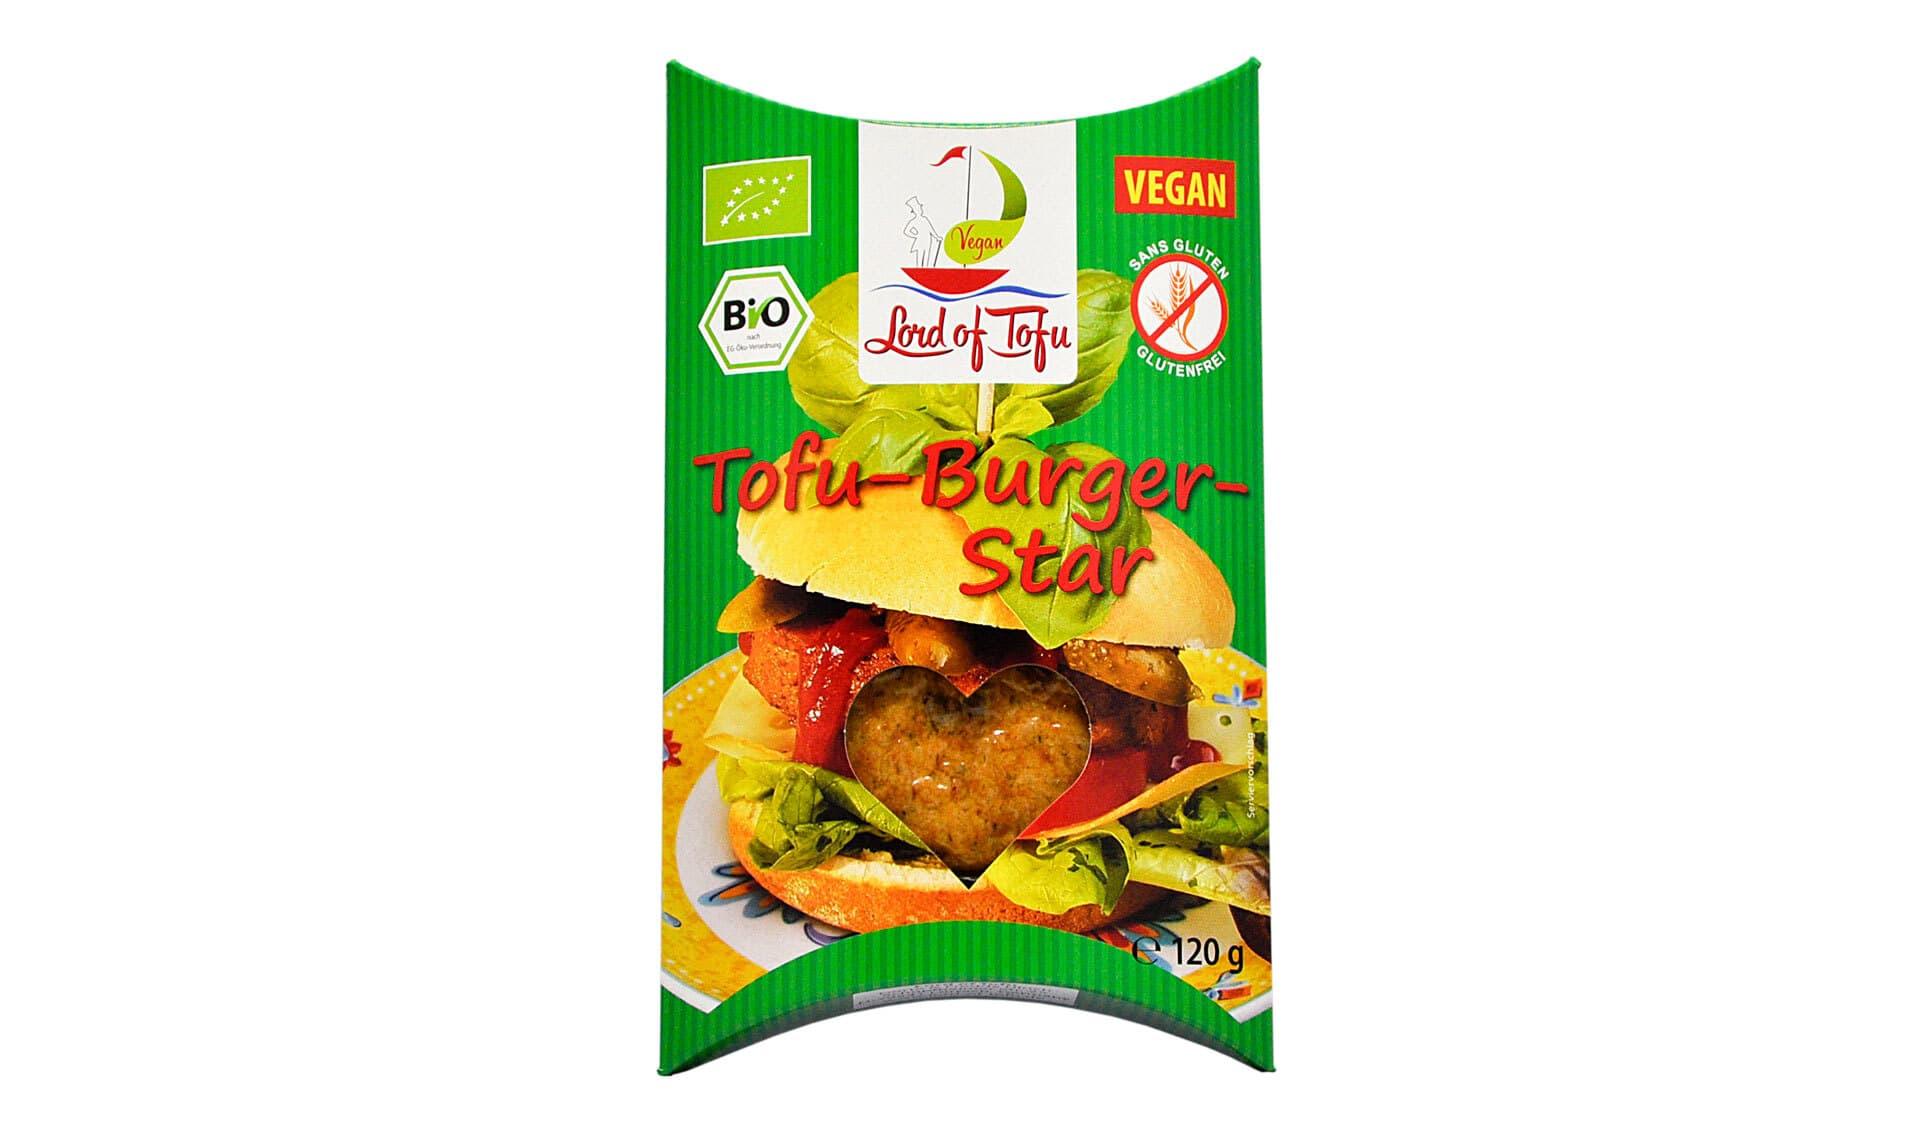 Lord of Tofu: Tofu Burger Star